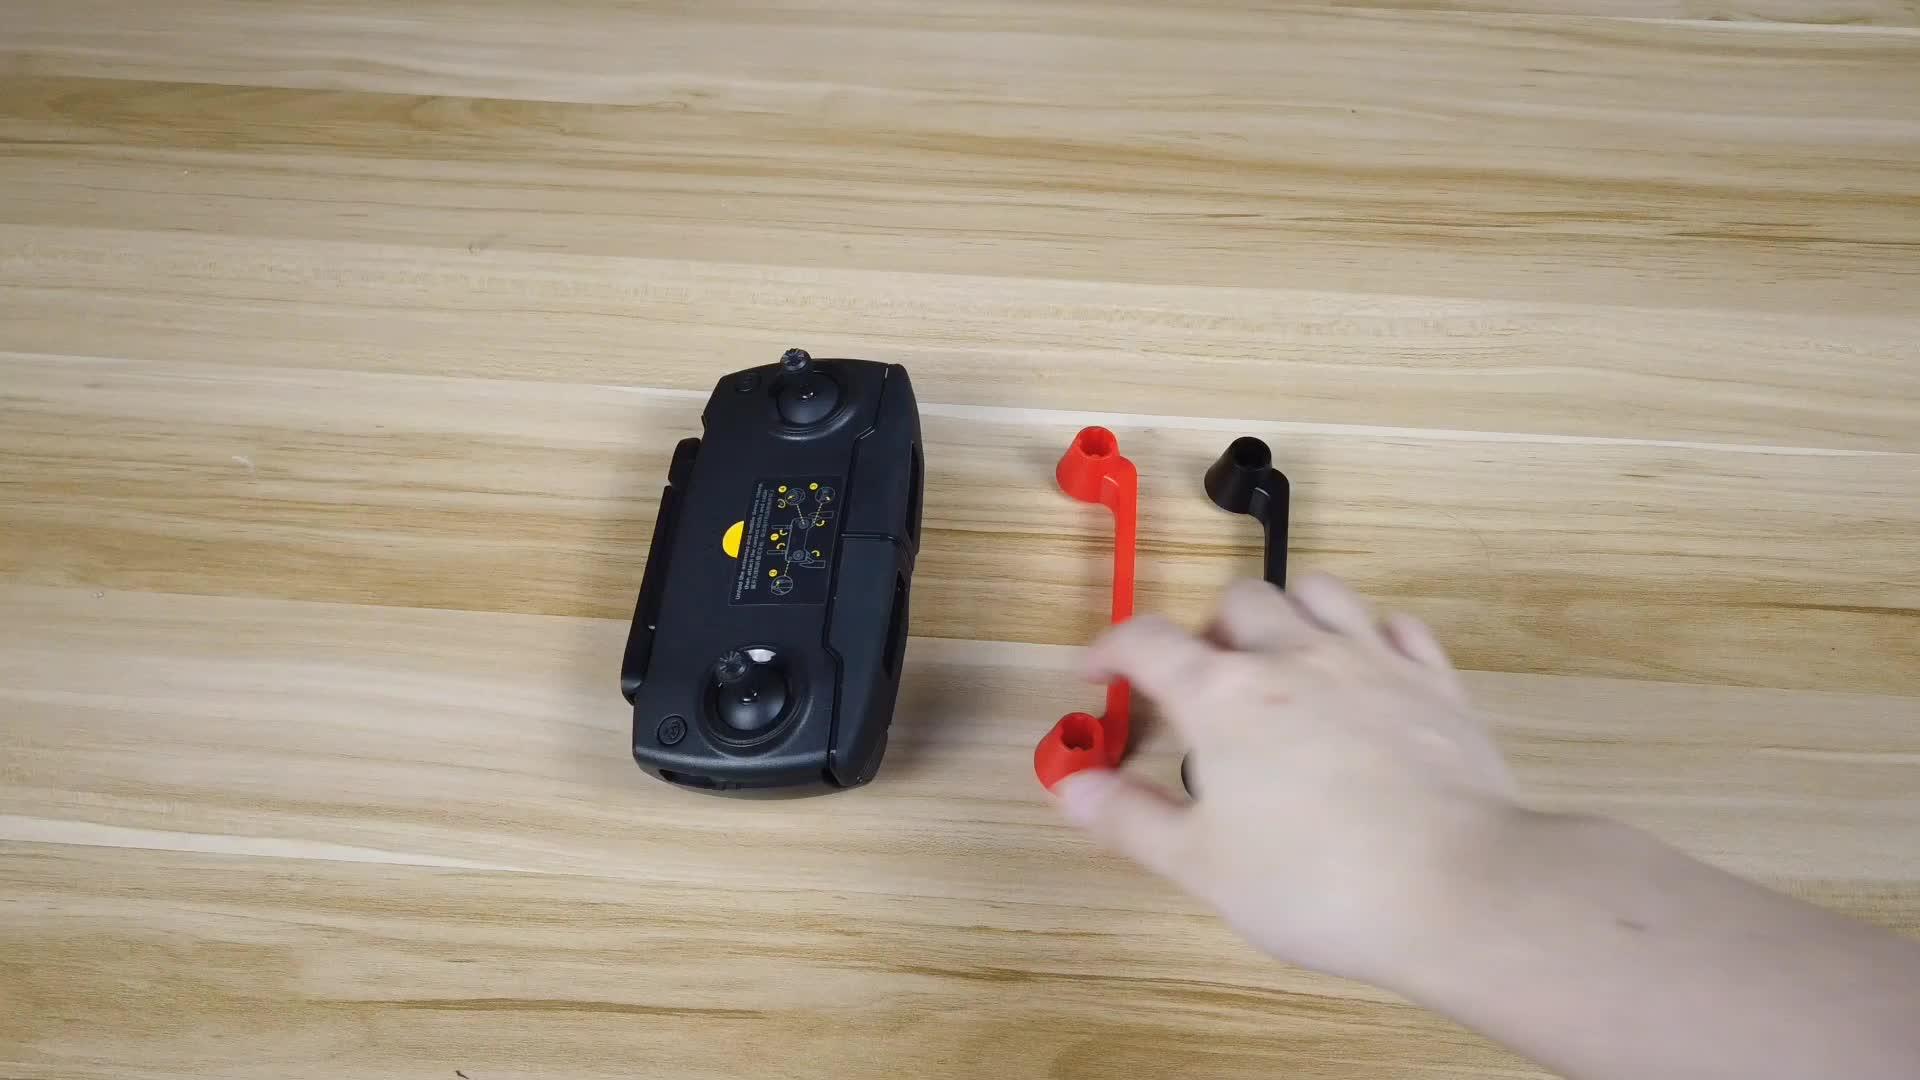 Red+Black Vior Joystick Protector for DJI Mavic Mini Controller